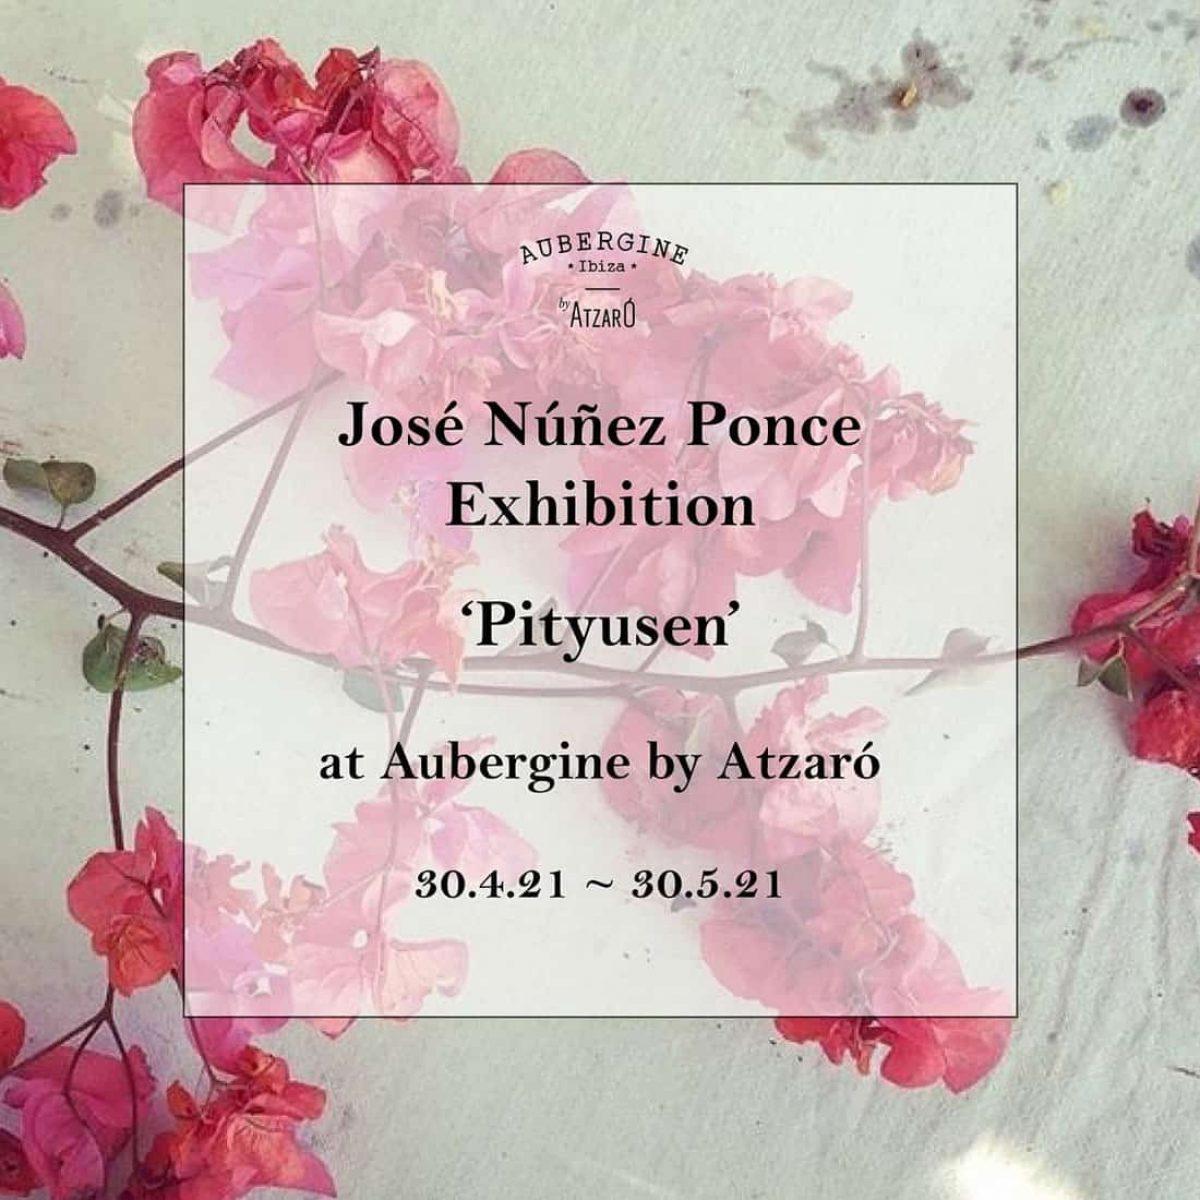 exposicion-fotografia-jose-nunez-ponce-restaurante-aubergine-ibiza-2021-welcometoibiza